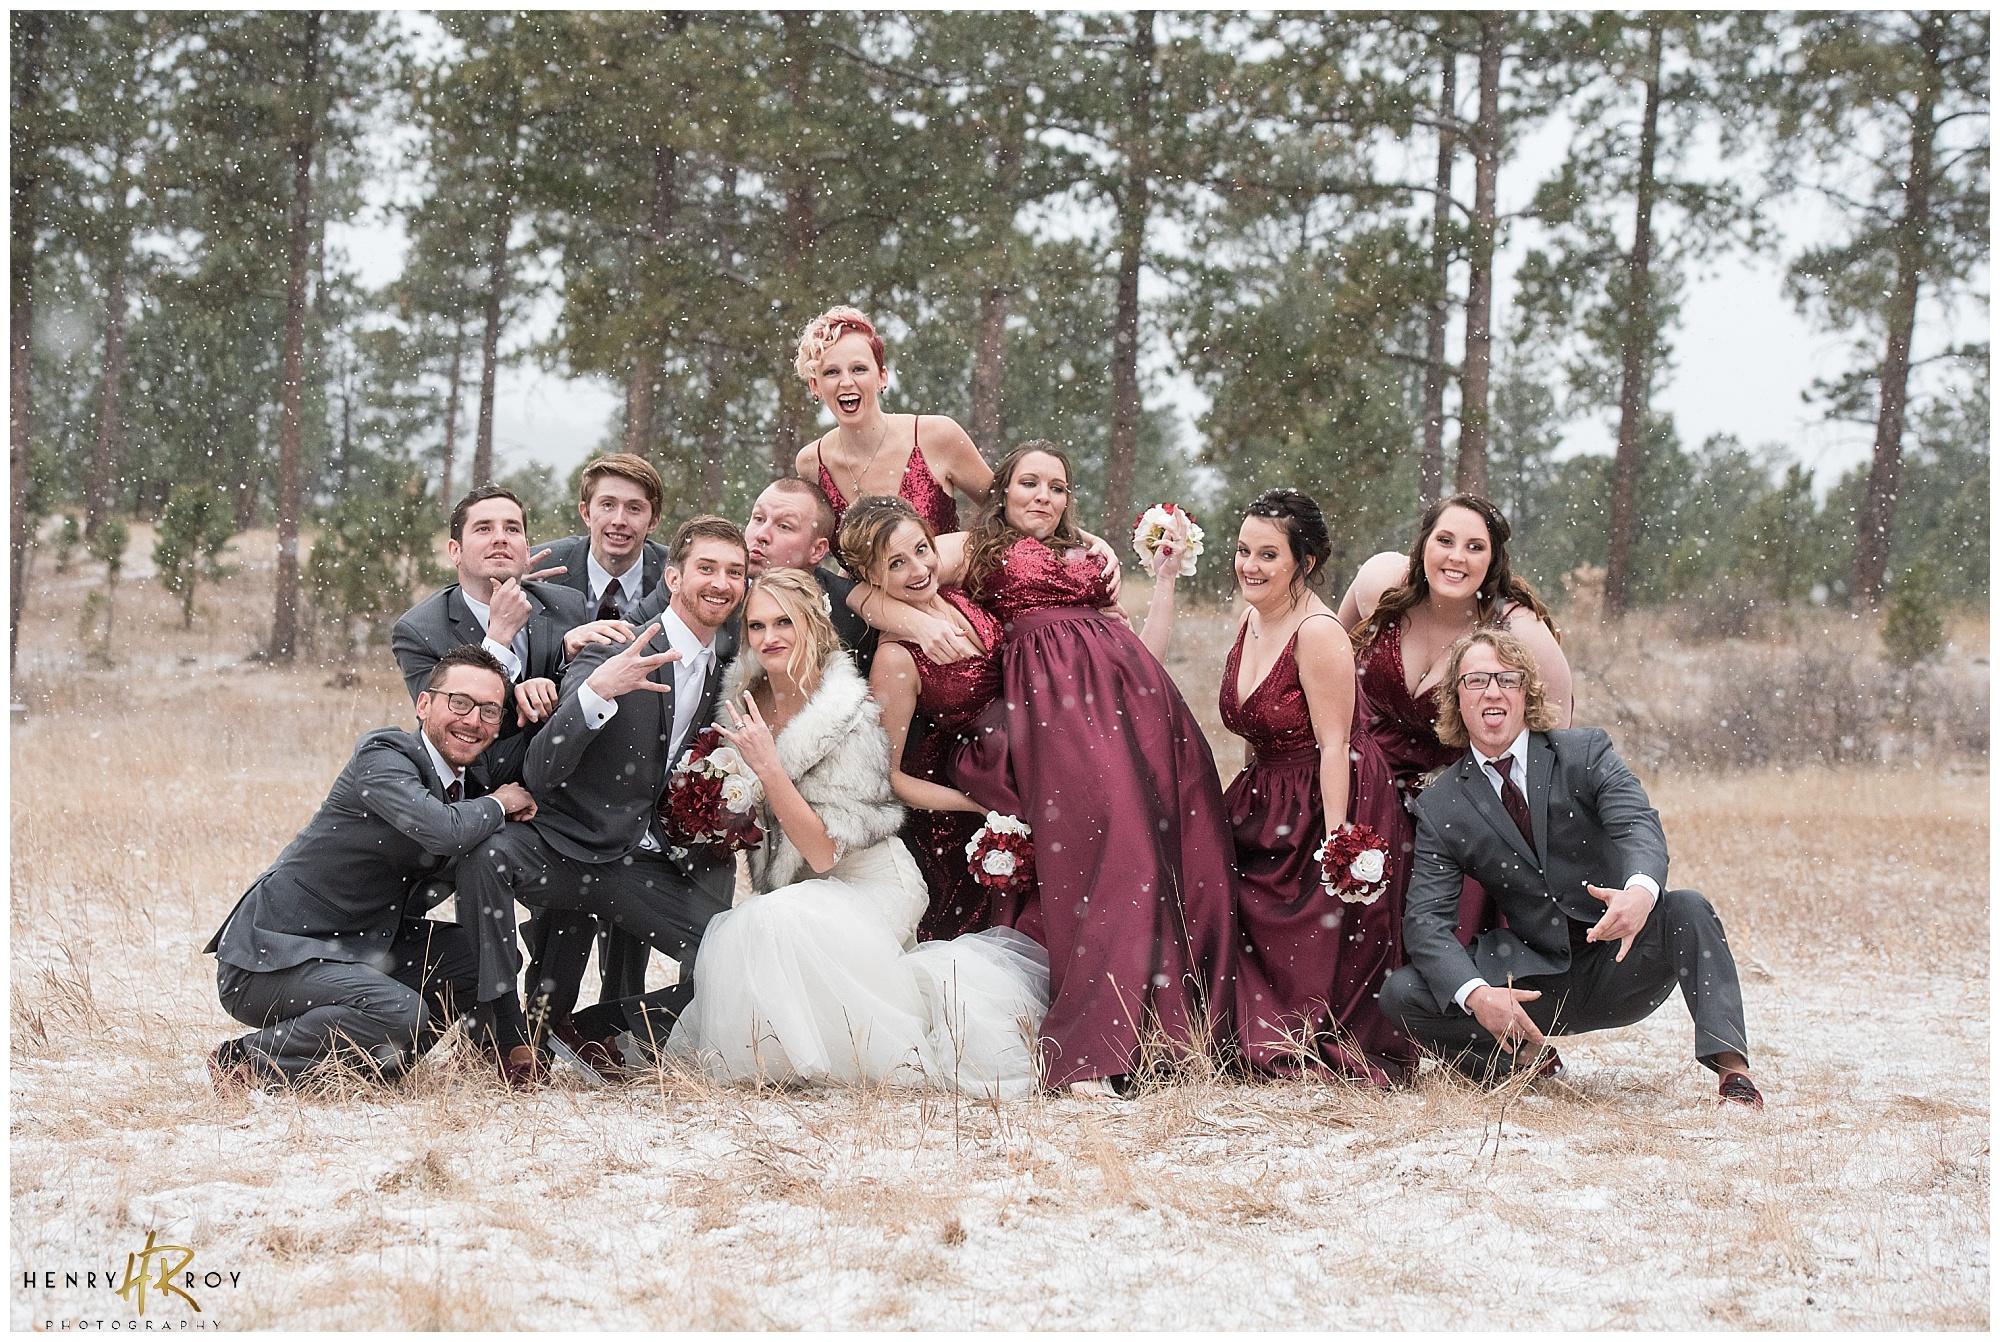 WEDDING PHOTOGRAPHER0029.jpg